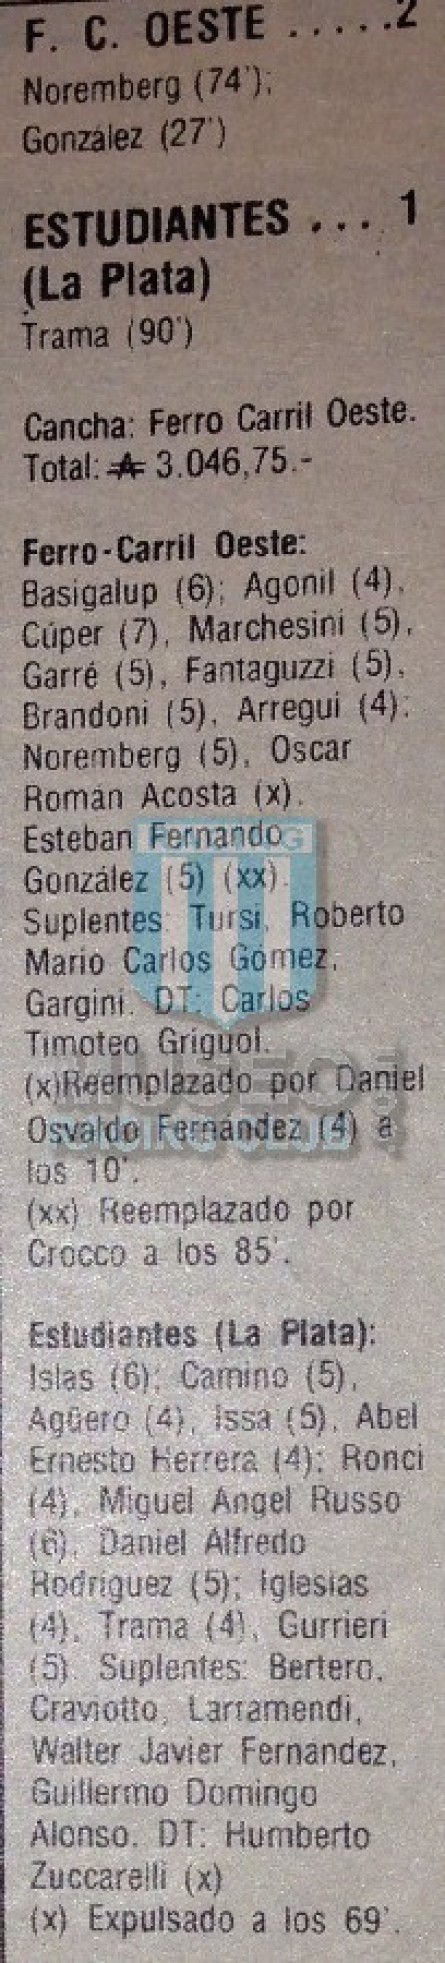 EstudiantesLP_1985_Home_Topper_FICHA_MC_7_JoseRaulIglesias_jugador_01